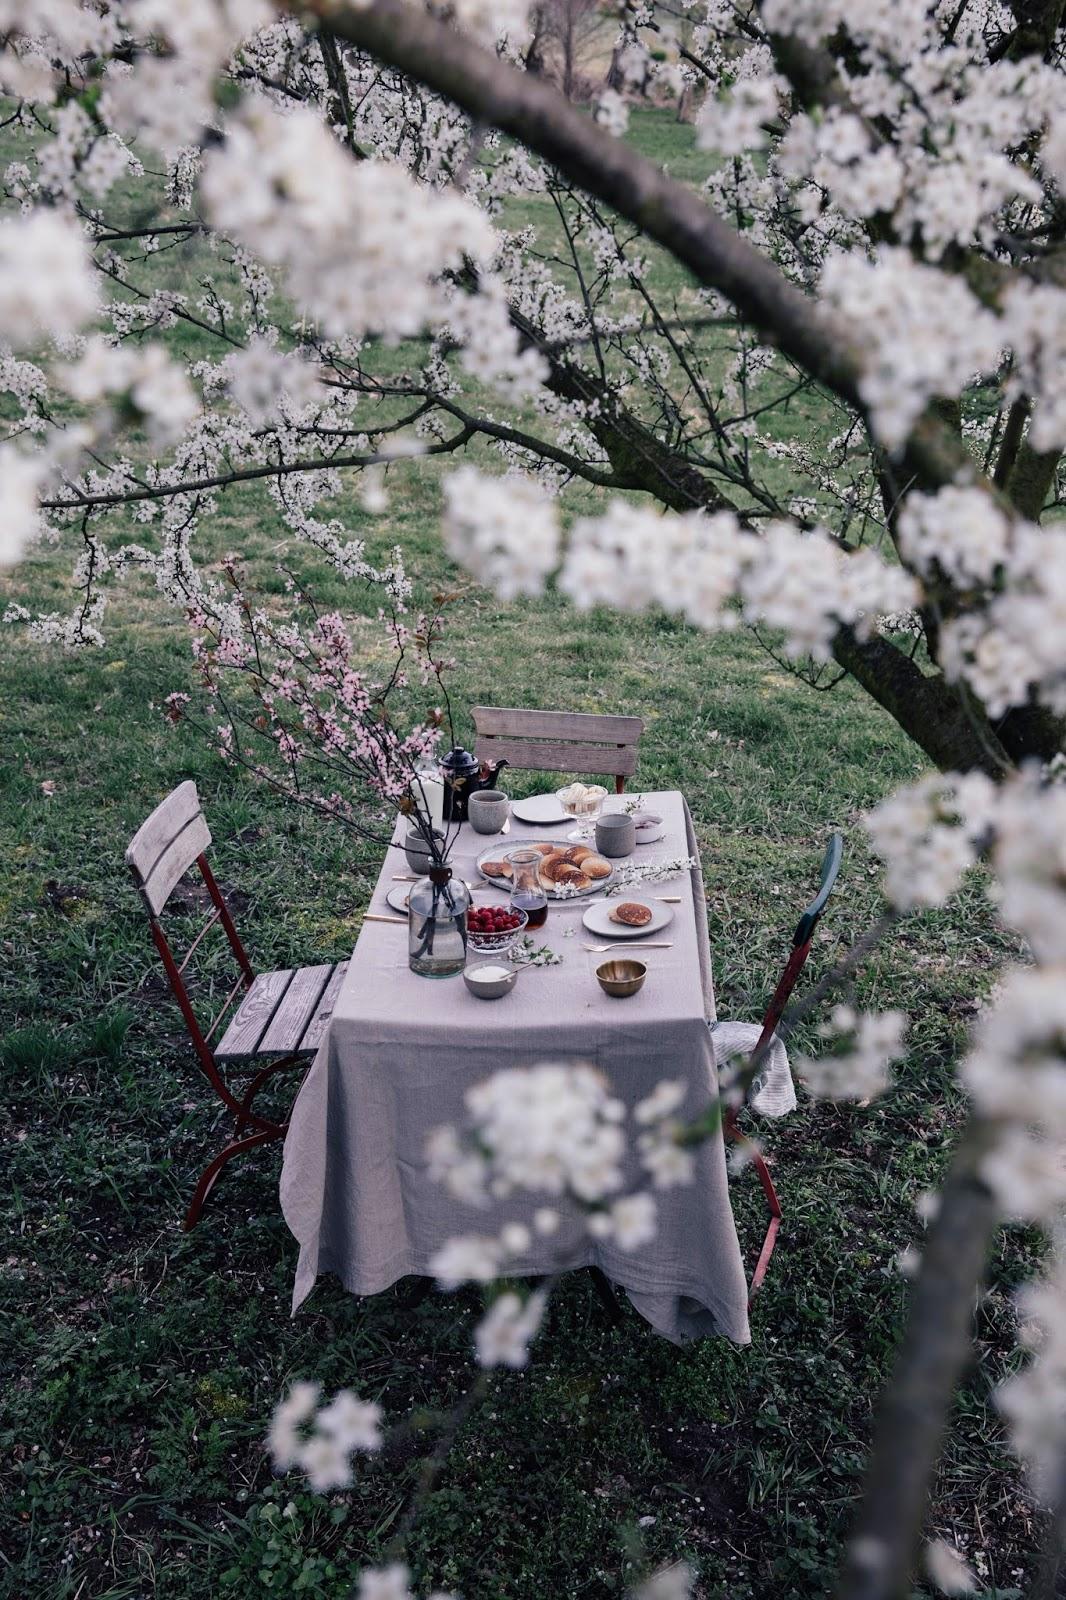 Spring-Breakfast under a Plum Tree